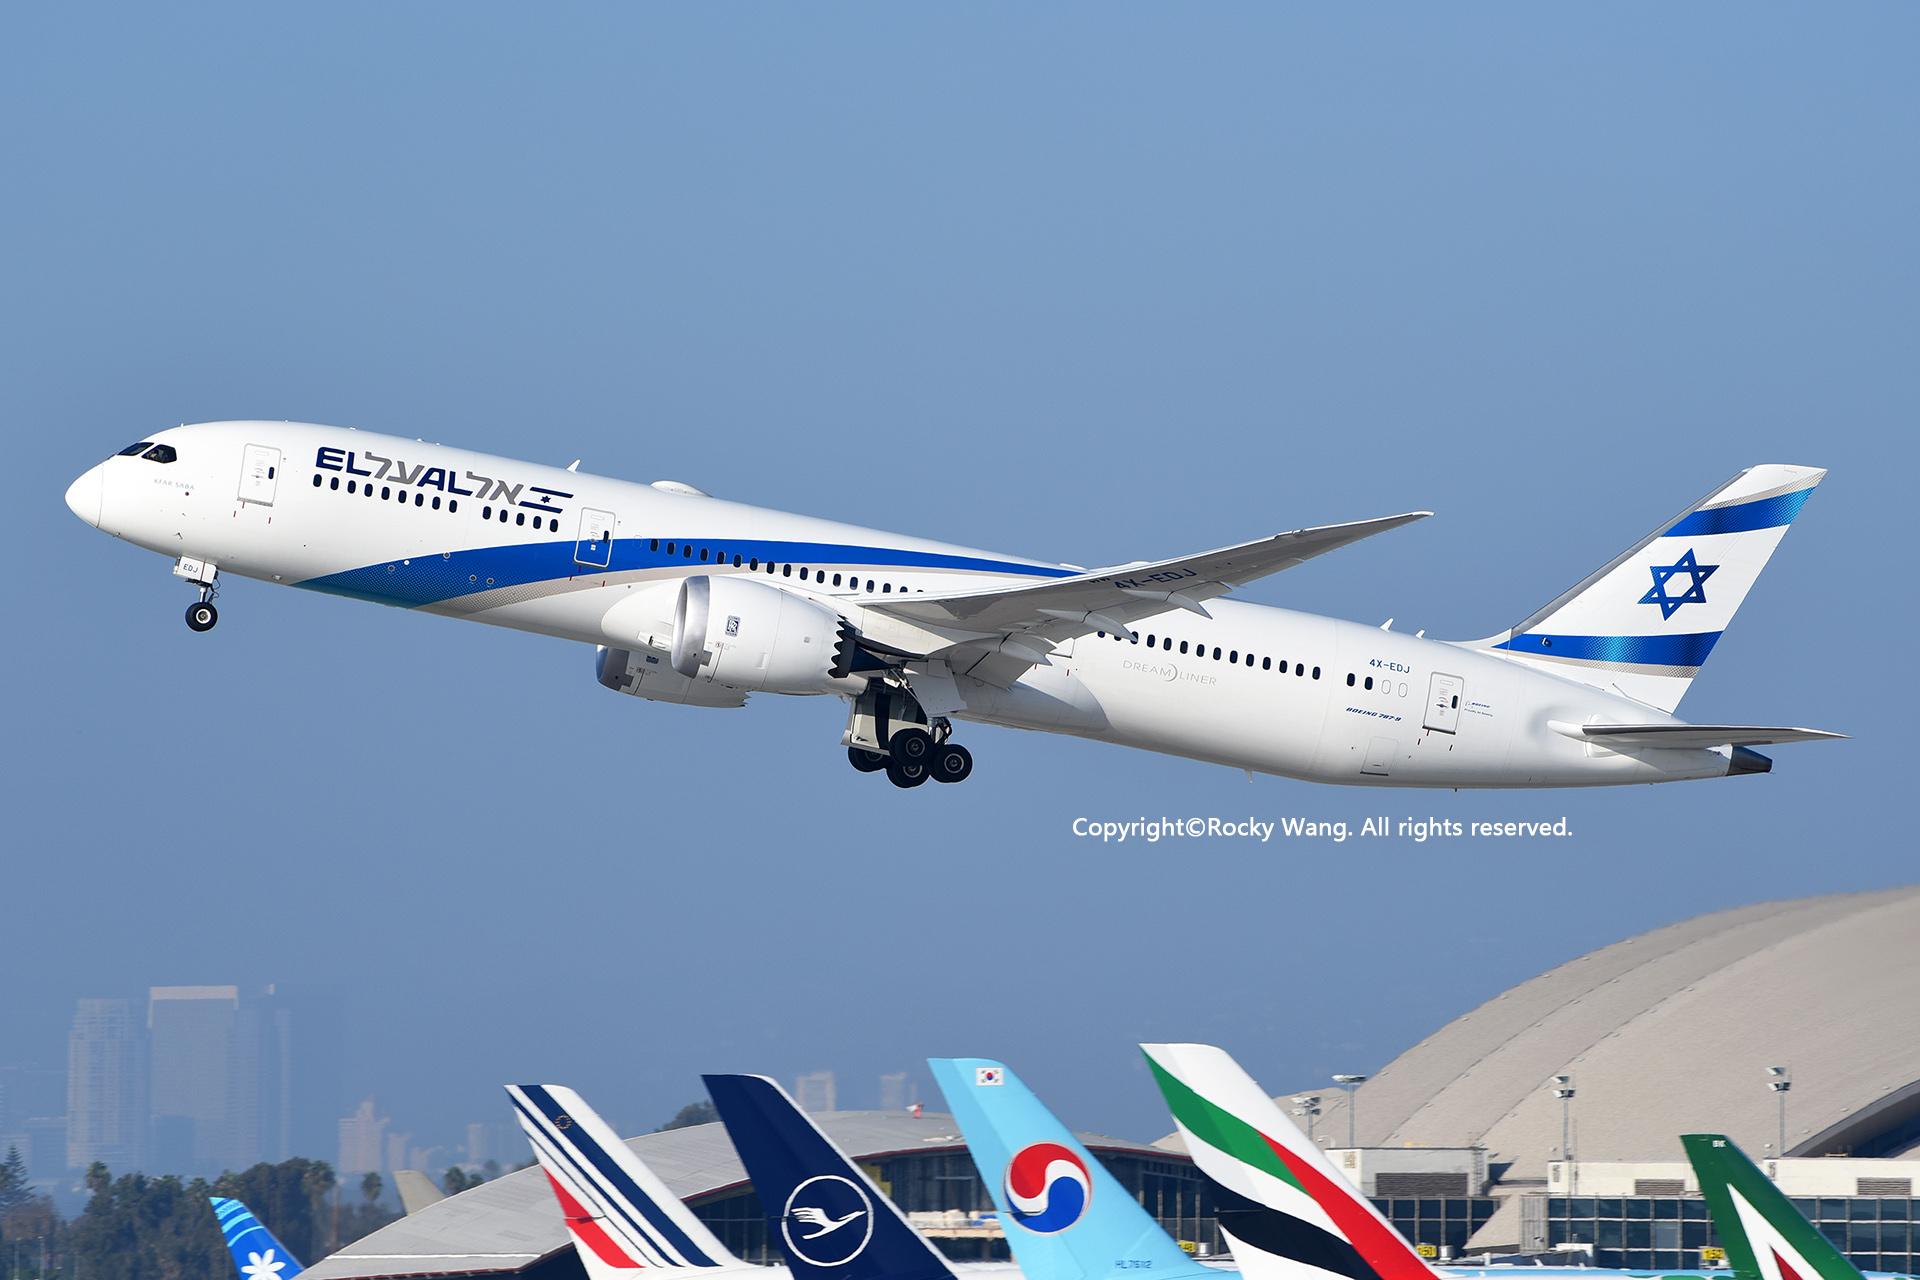 Re:[原创]随便来一组 不凑30图了 BOEING 787-9 DREAMLINER 4X-EDJ Los Angeles Int'l Airport